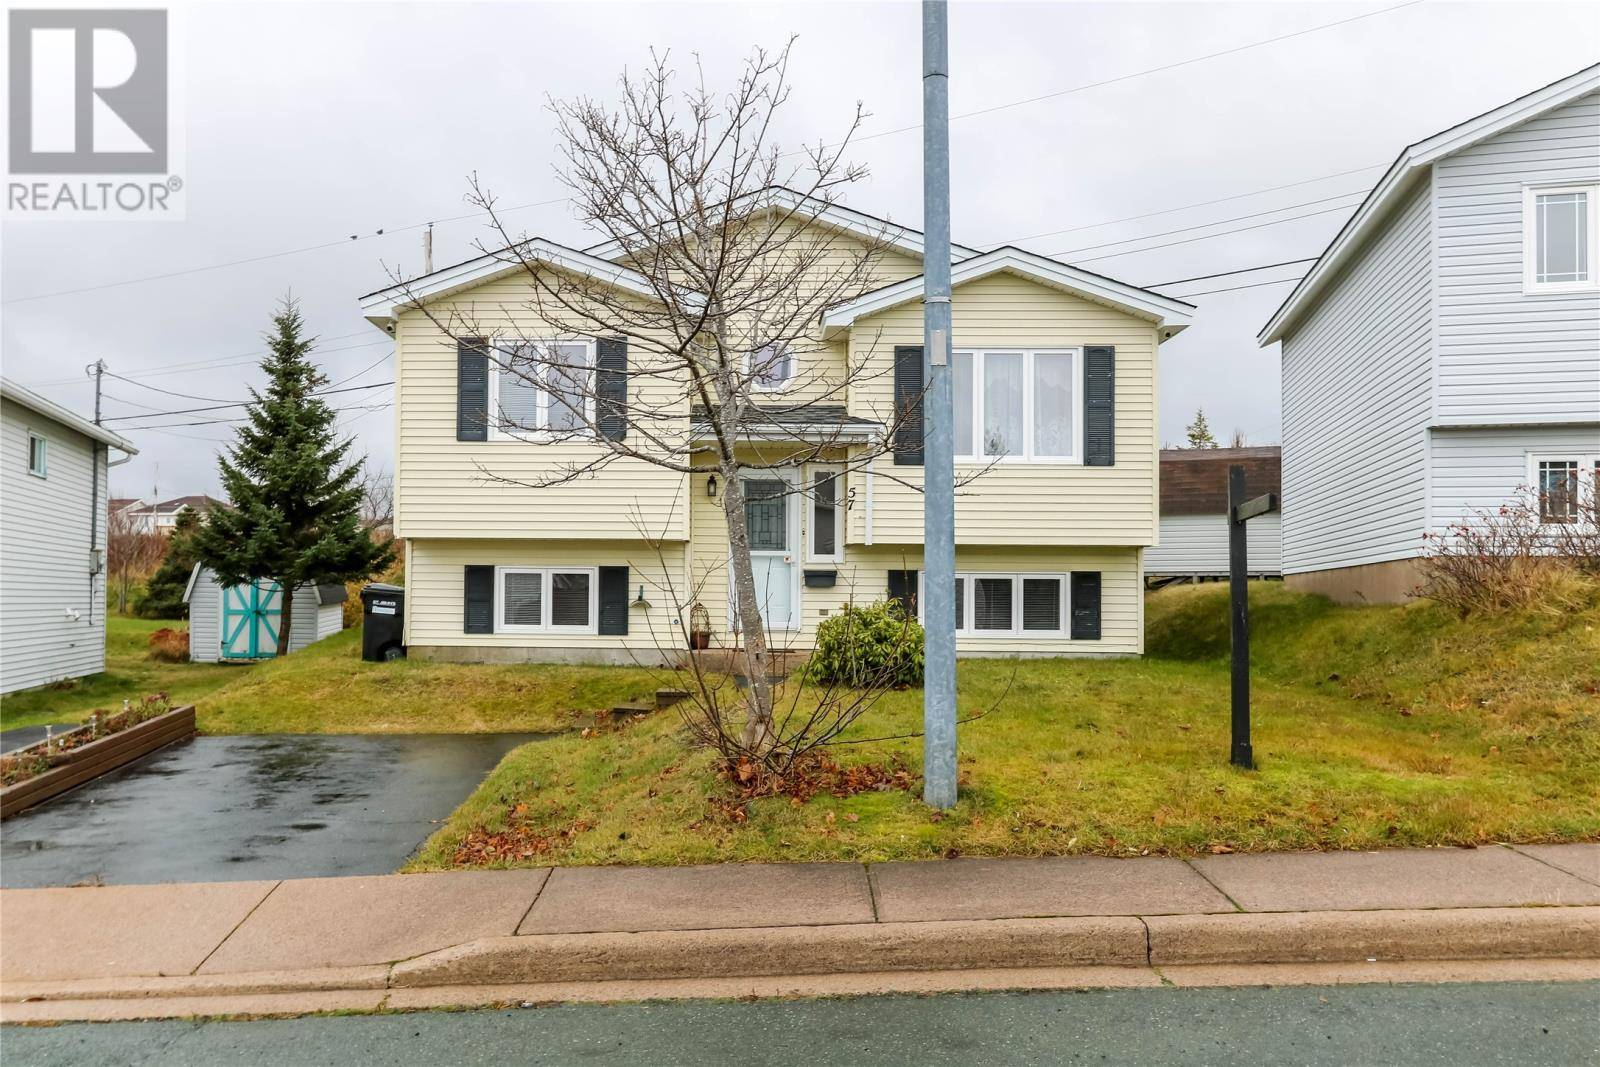 House for sale at 57 Notre Dame Dr St John's Newfoundland - MLS: 1207540